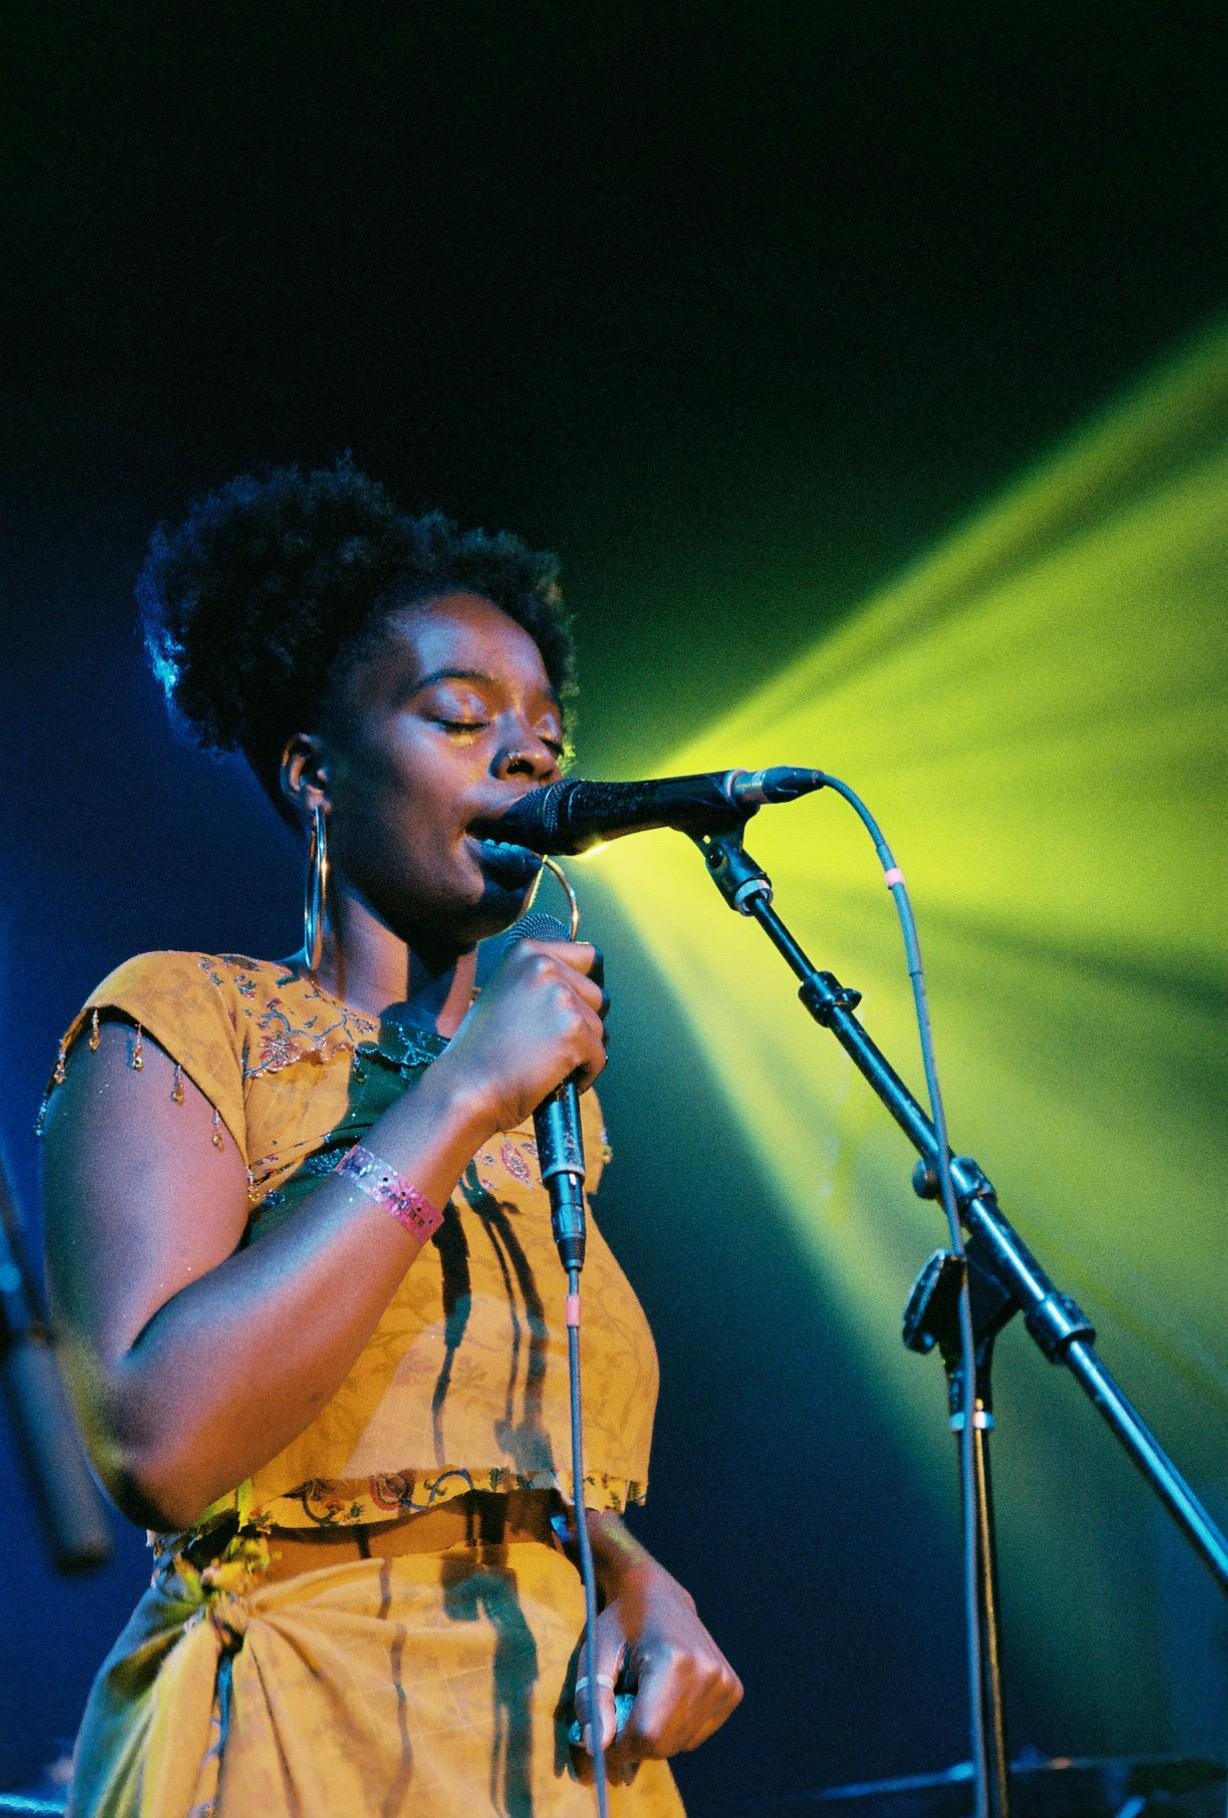 Houston performers M3CCA, Mufasa Enzor unite for nostalgic soul